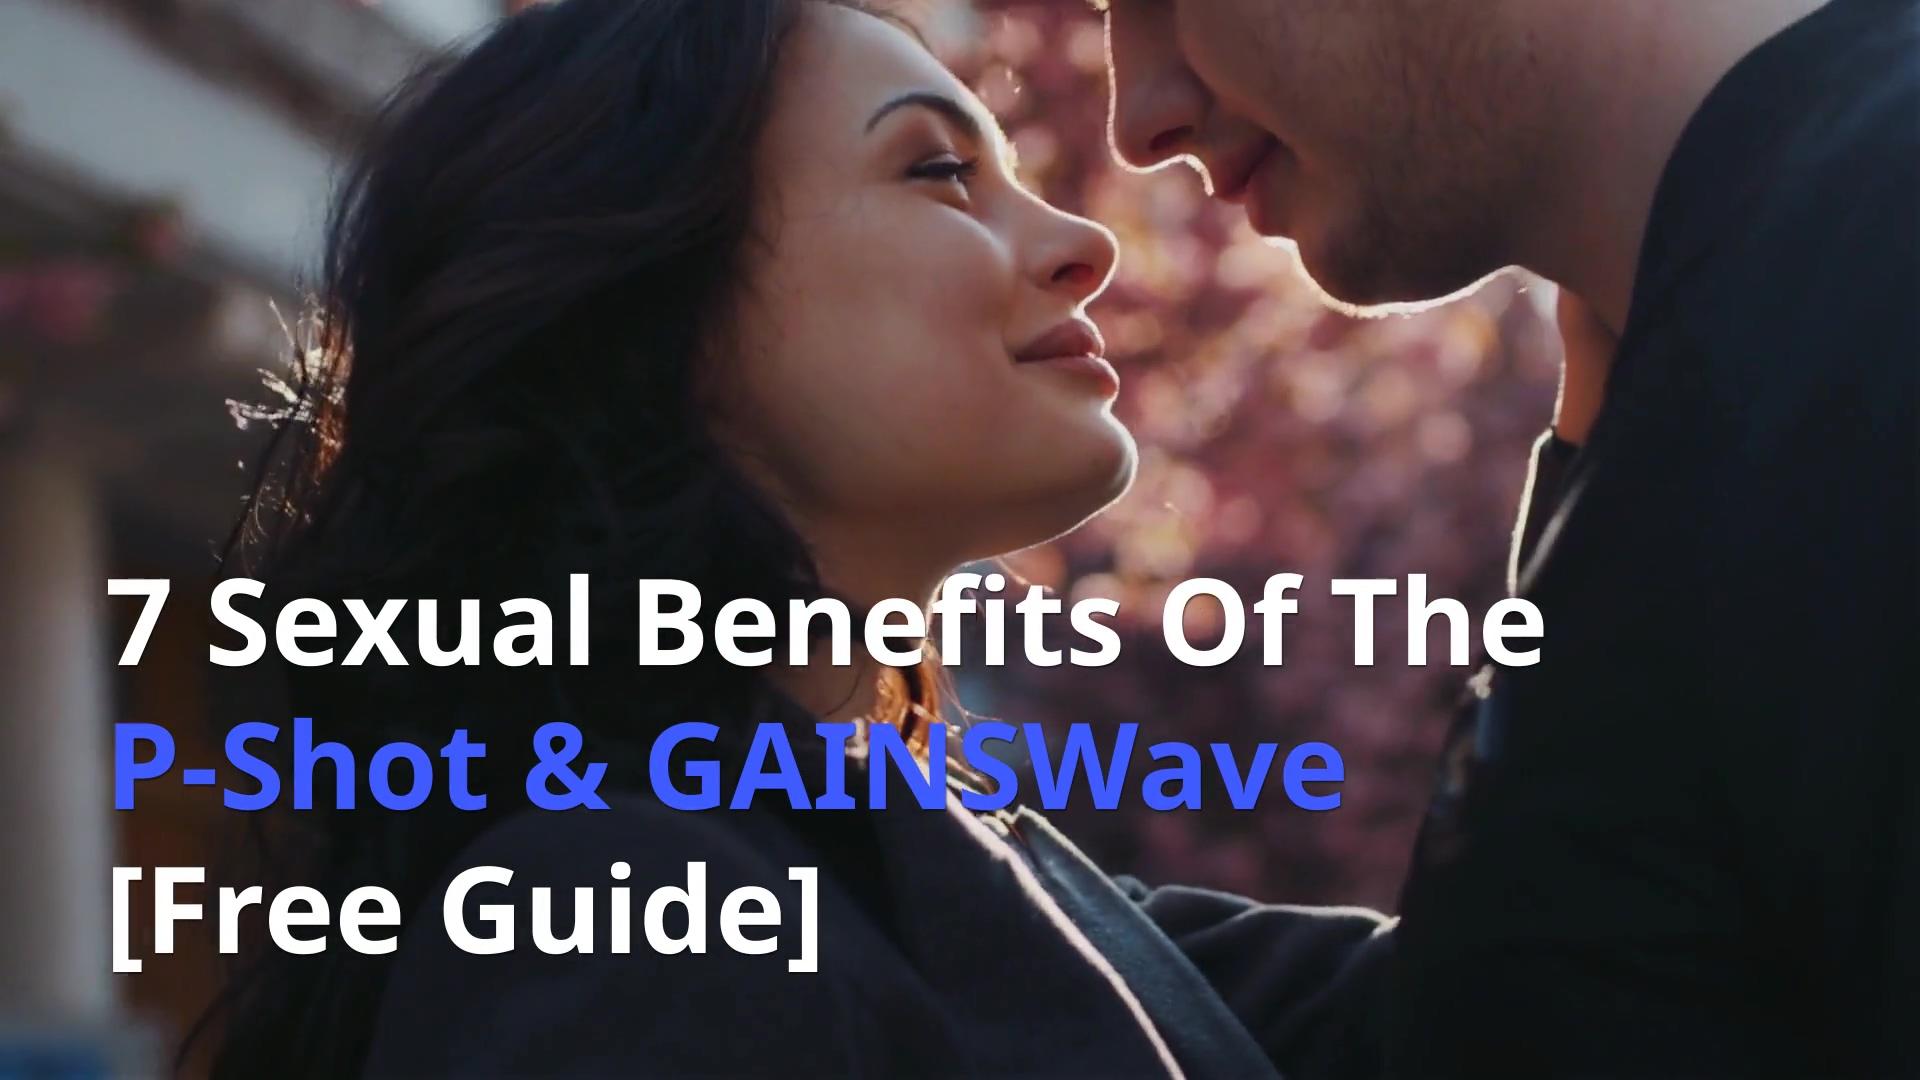 7-sexual-benefits-pshot-gainswave(matrix)